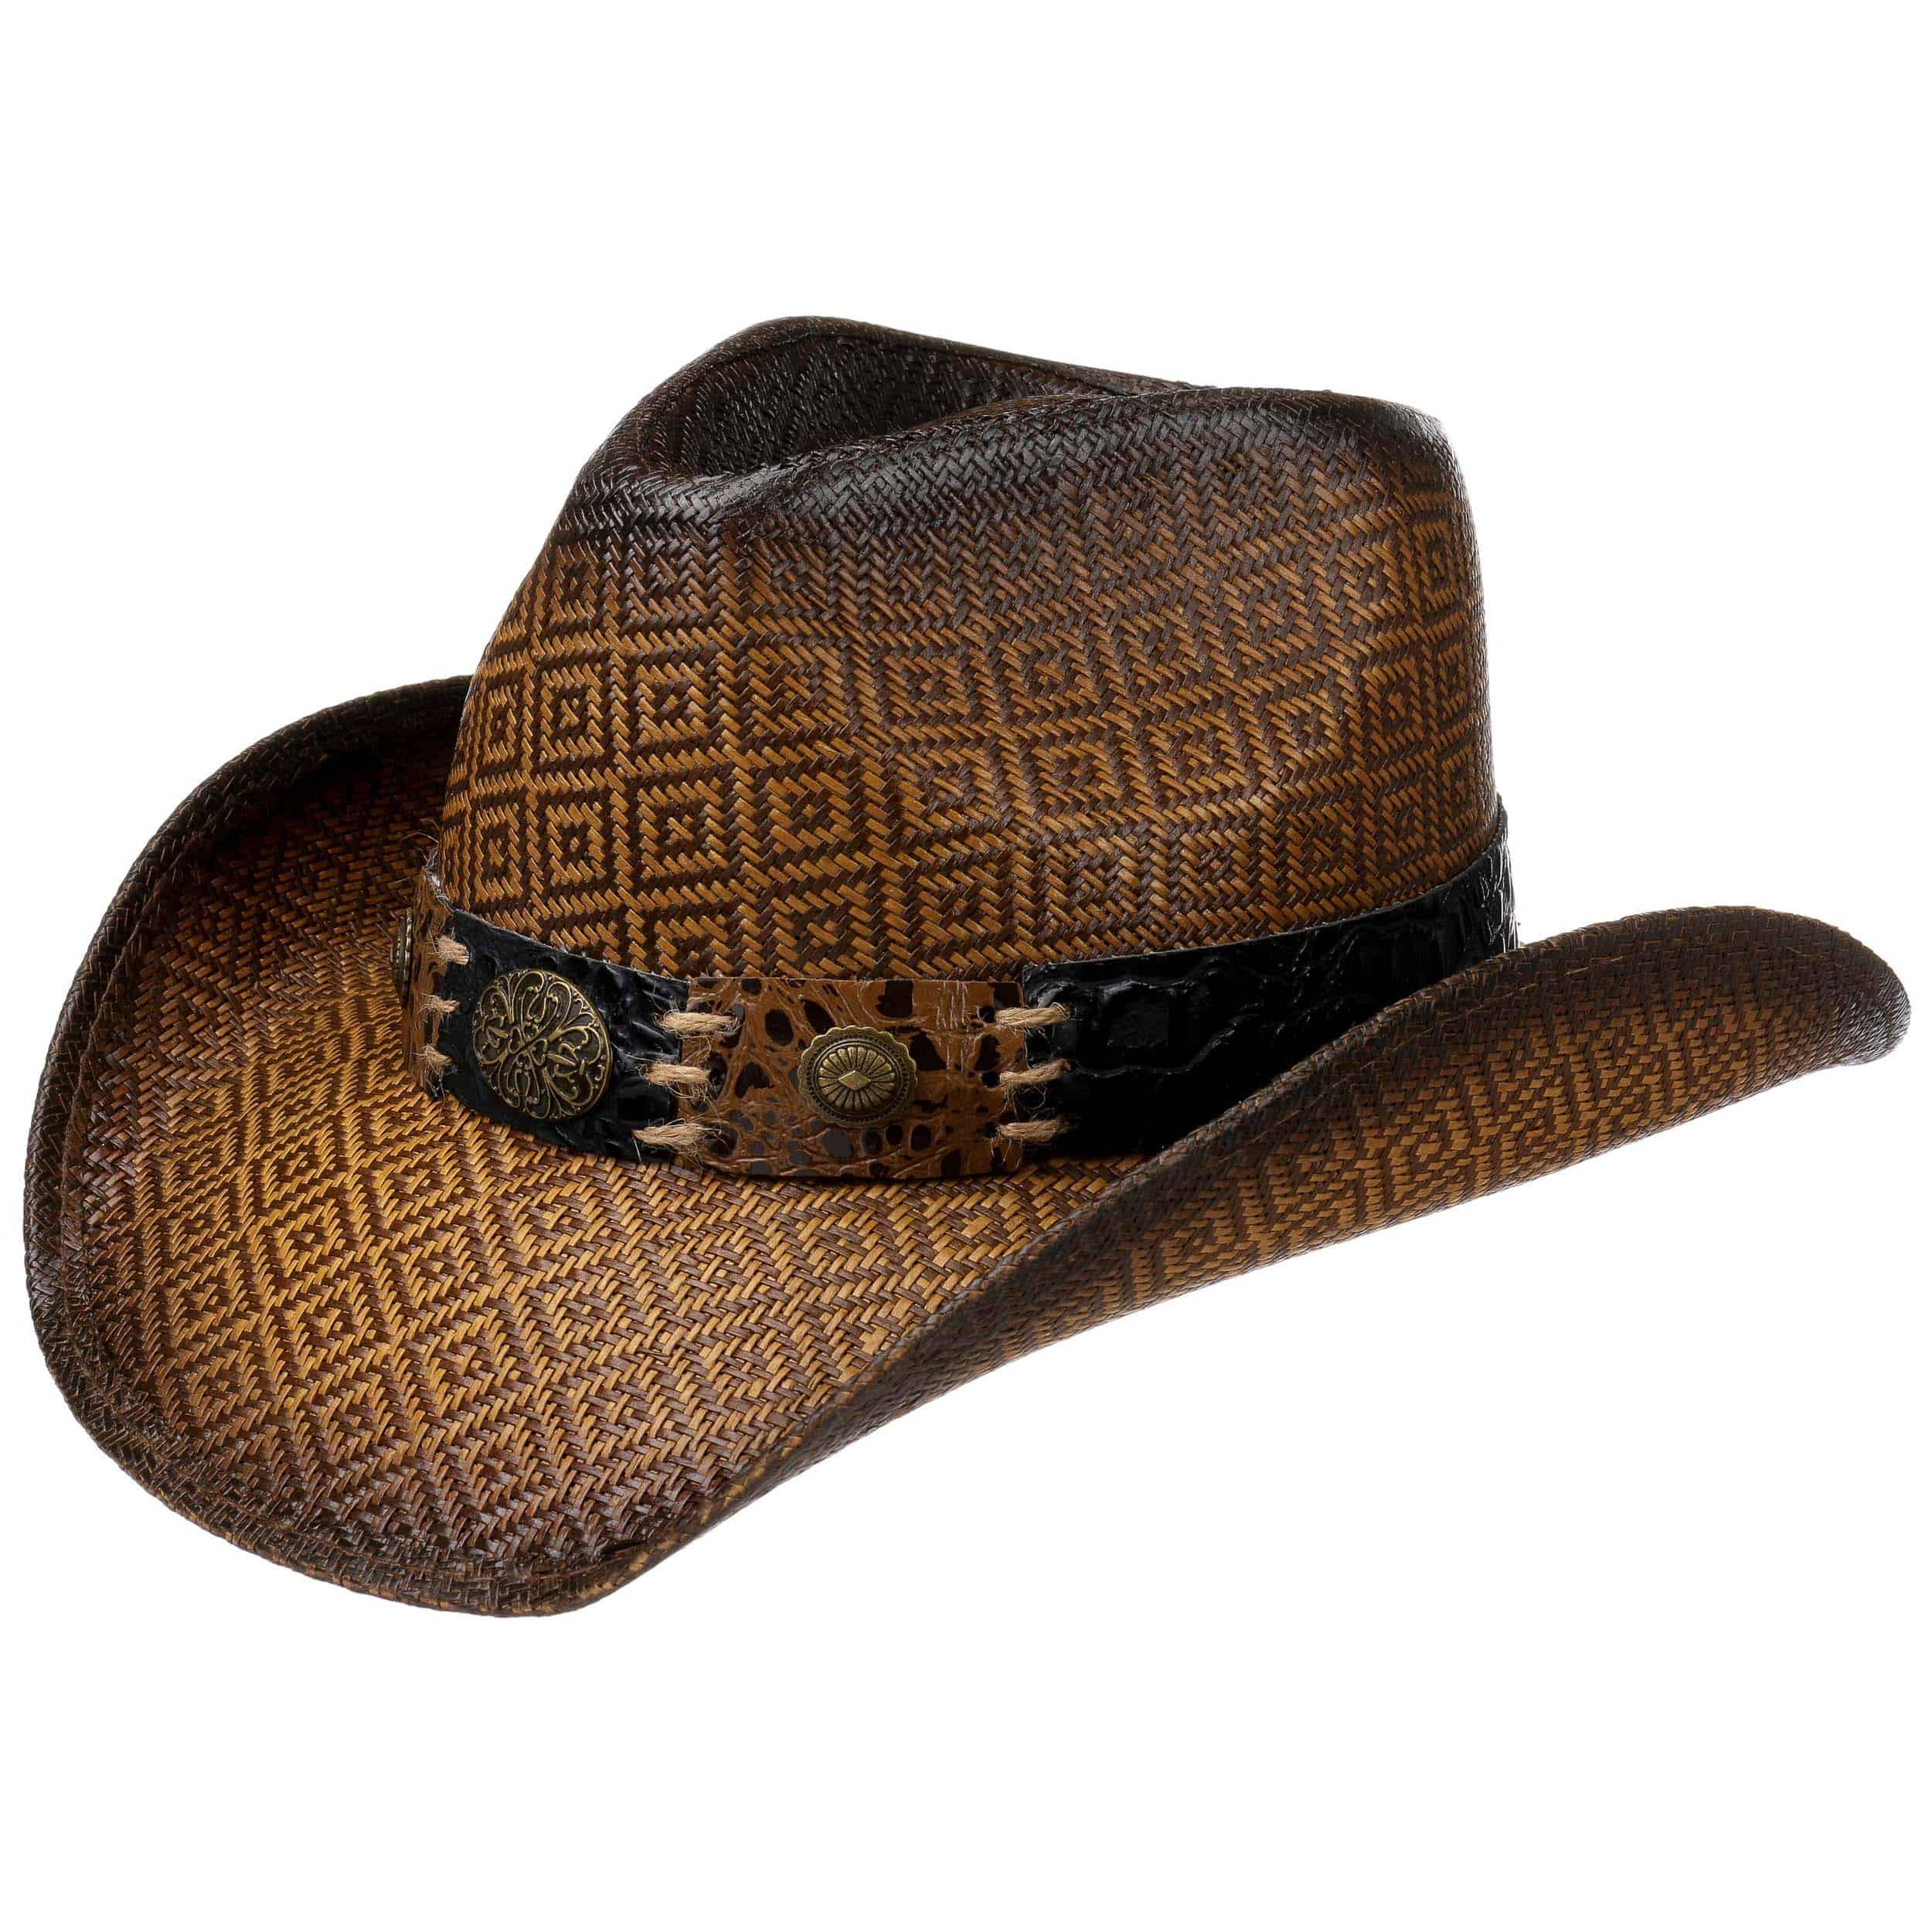 ... Cappello da Cowboy Squares by Lipodo - marrone 4 98efbb9dd272